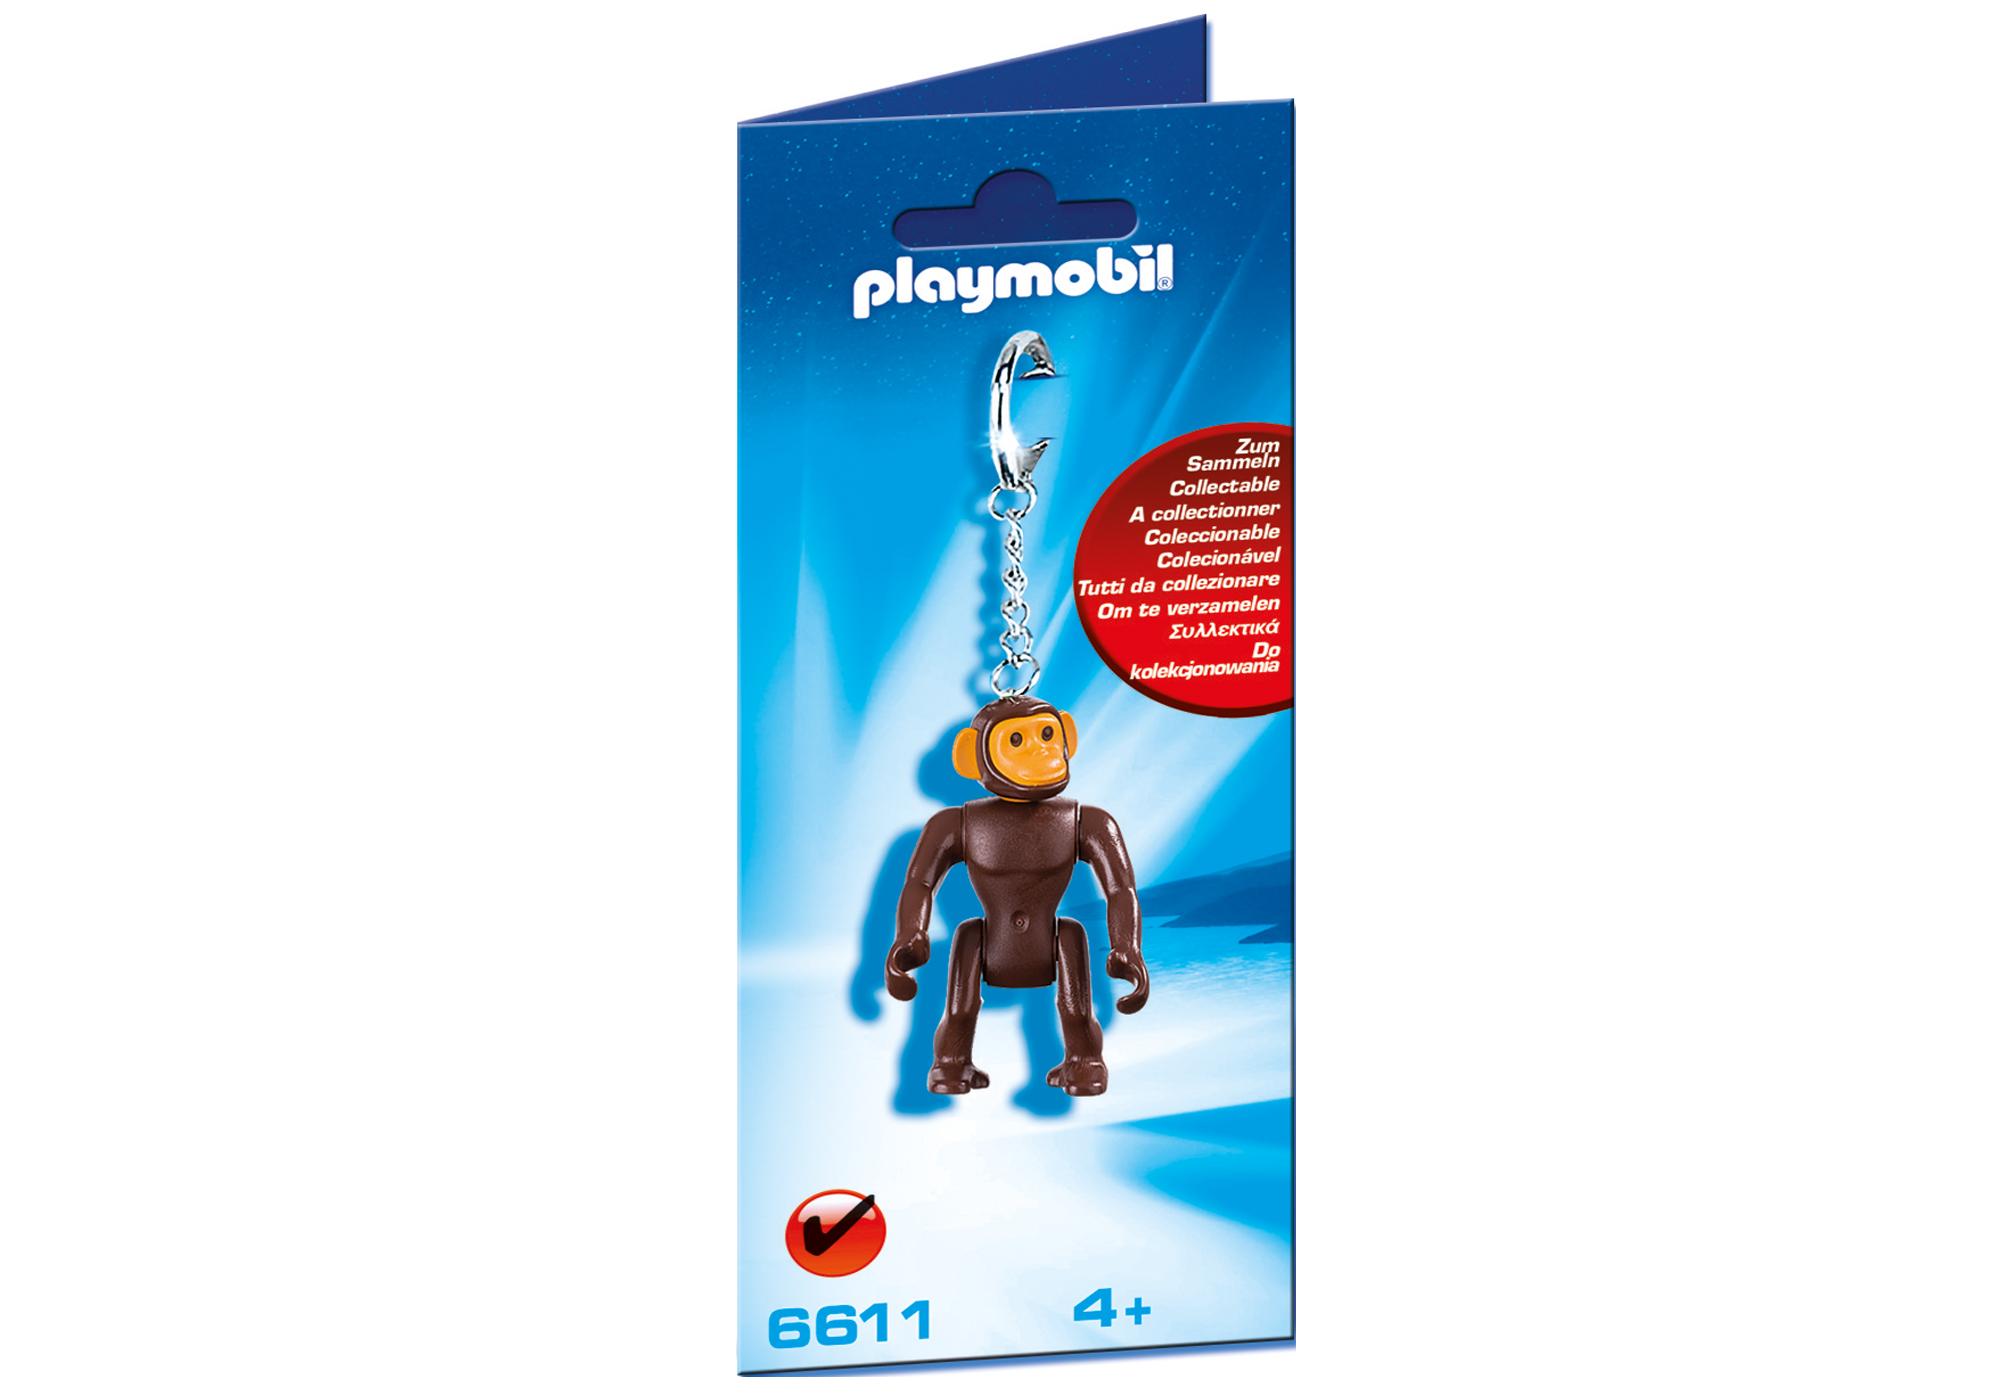 http://media.playmobil.com/i/playmobil/6611_product_box_front/Schlüsselanhänger Schimpanse